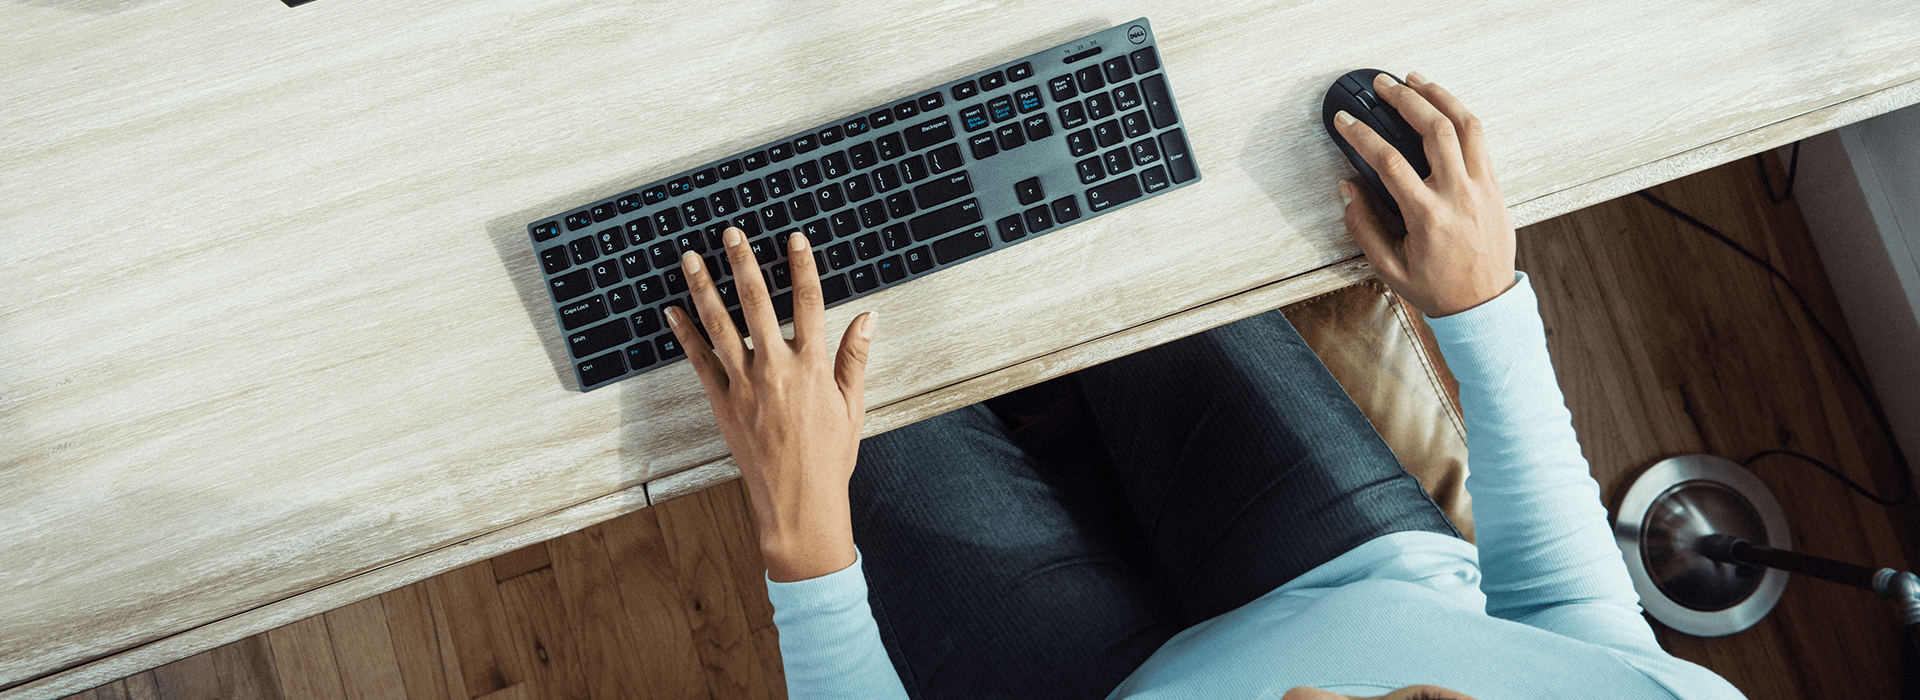 Home Office ergonomia